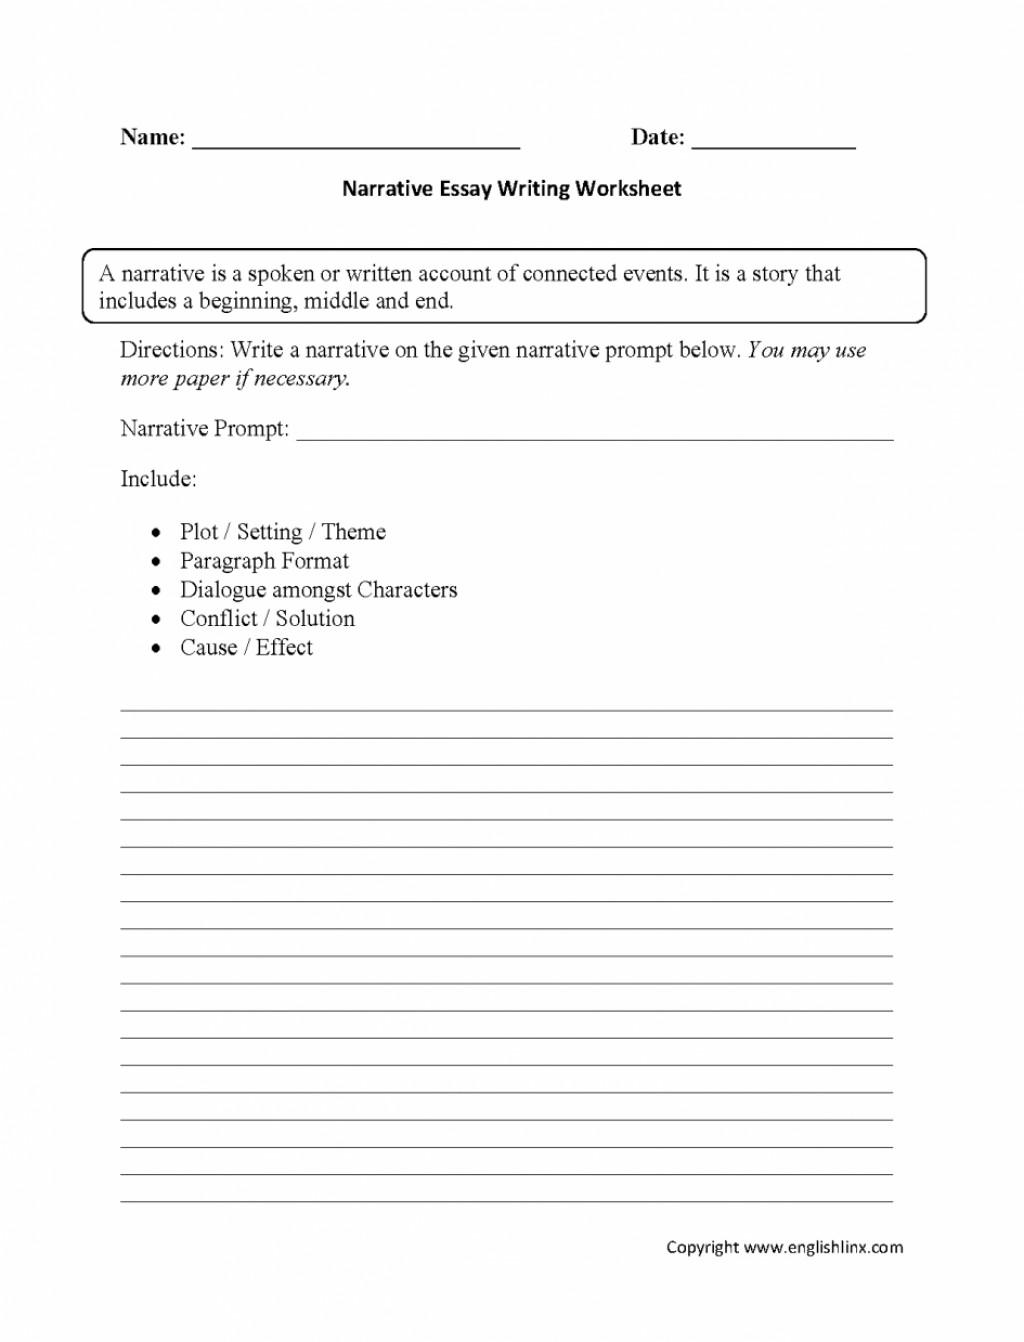 001 Essay Example 3rd Grade Paragraph Writing Worksheets Download Free Third Printa Worksheet Narrative Online Sensational Grader For Teachers Paper Students Large